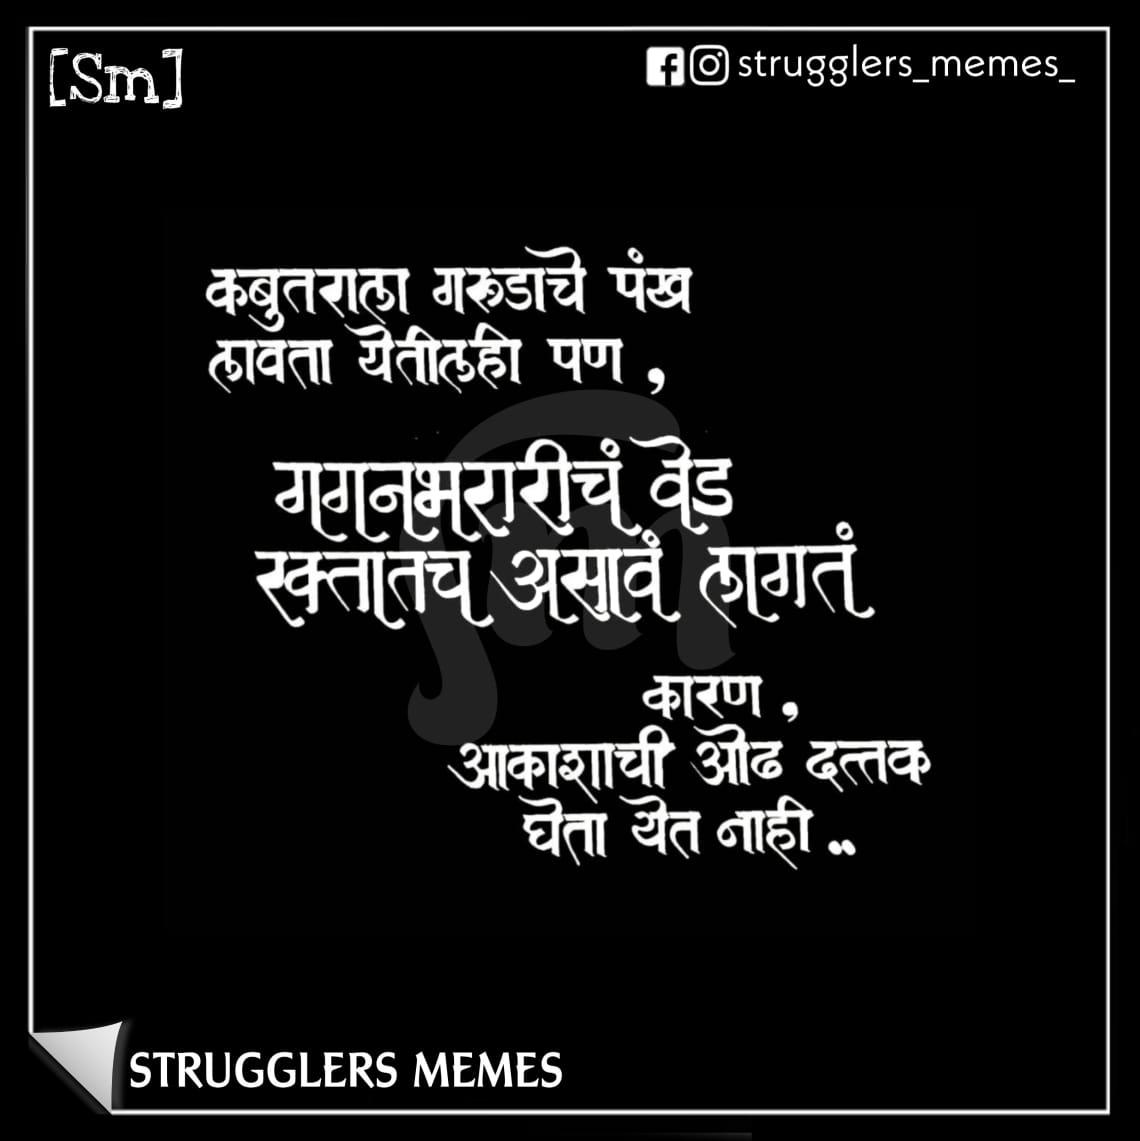 💯 फॉलो @MemesStrugglers #strugglersmemes #memes2021 #tales  #relatabletales #quotes #dailymemes #Share #Viral #MEMES #Tales #qoutes #marathijokes #marathipost #doraemon #dankmemesdaily #Tandav #marathimotivational #MEMES #marathi #india #Mumbai #Maharashtra  #WINTER #Trending